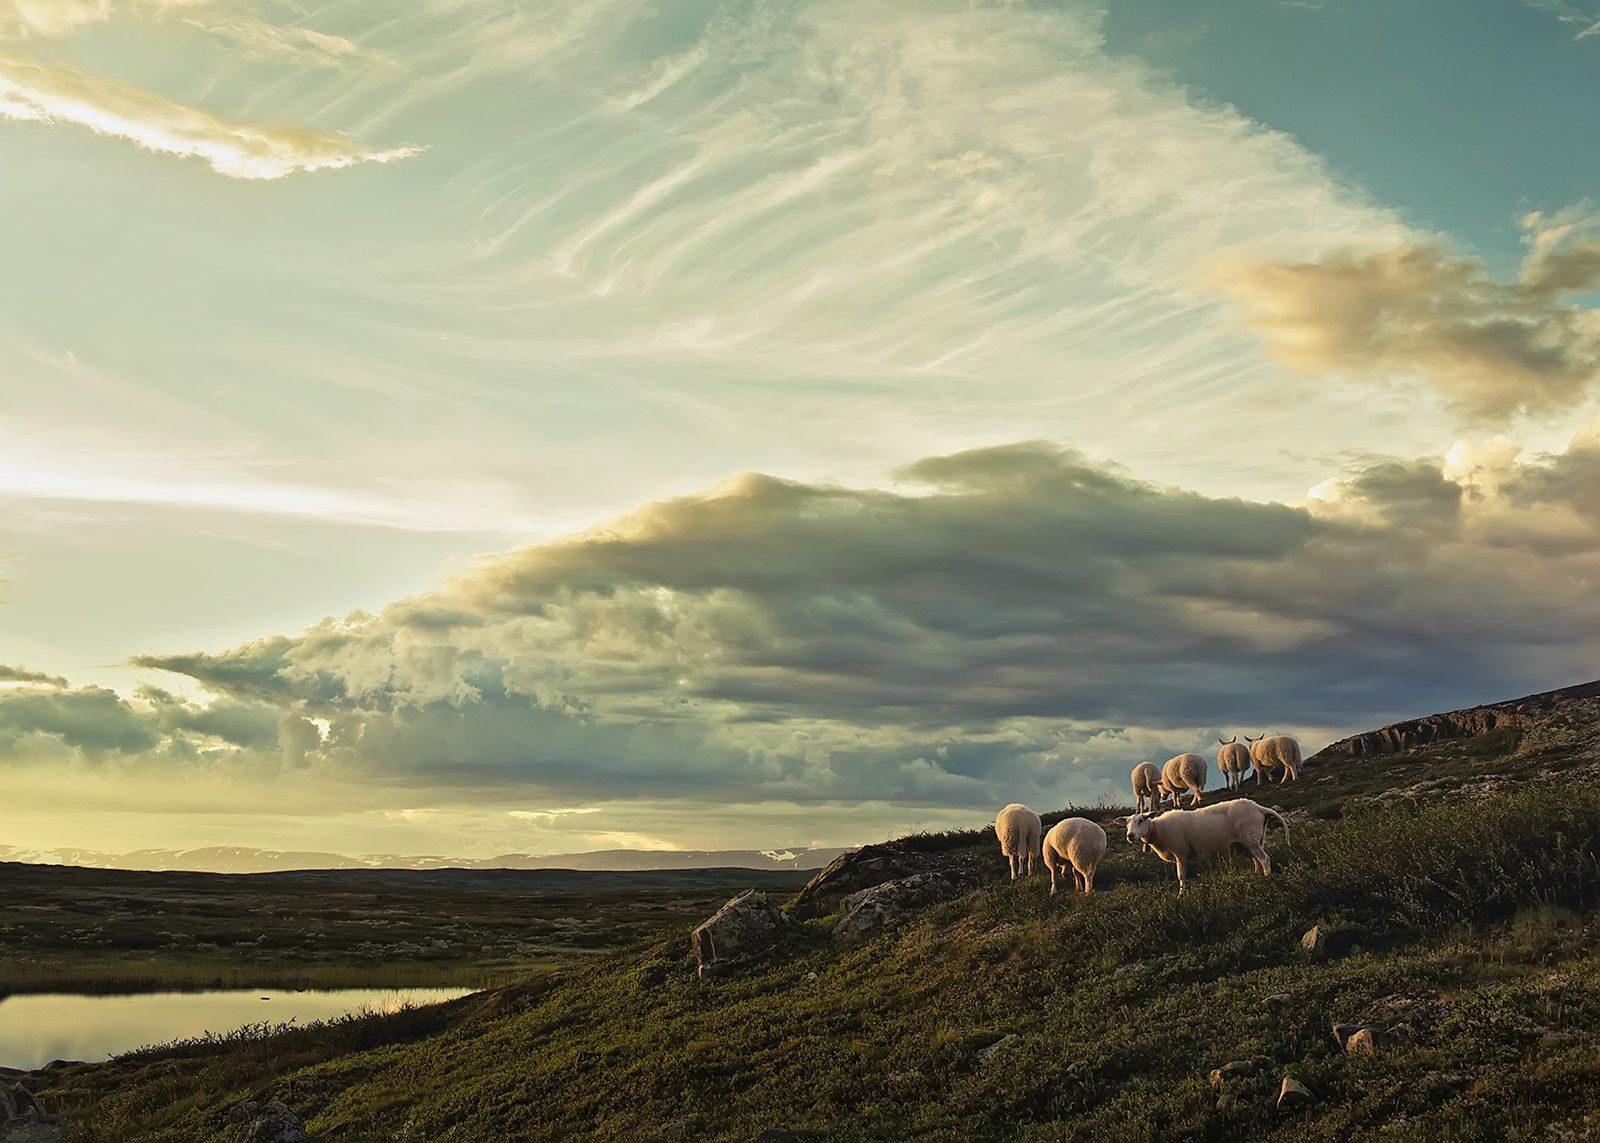 Sauer på Hardangervidda av Peder Aaserud Eikeland